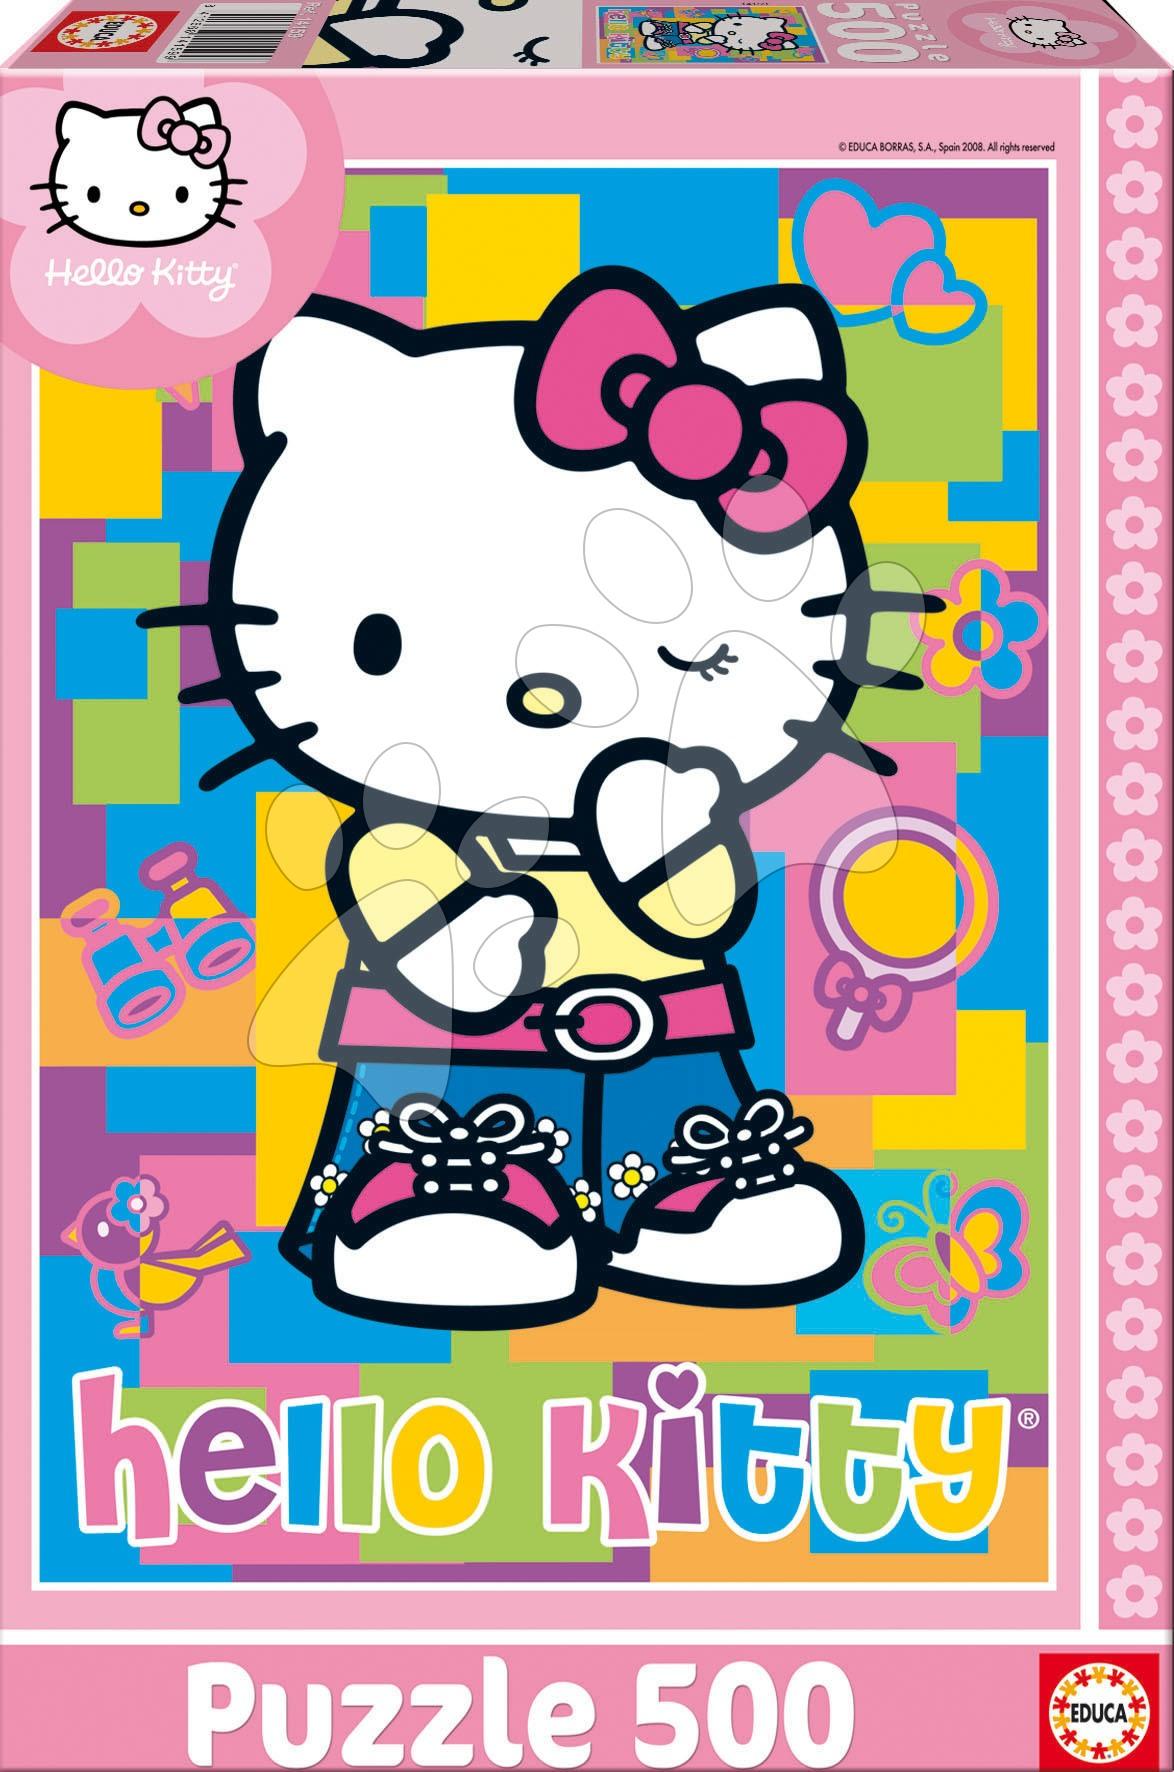 Puzzle 500 dílků - Puzzle Hello Kitty Educa 500 dílů od 11 let